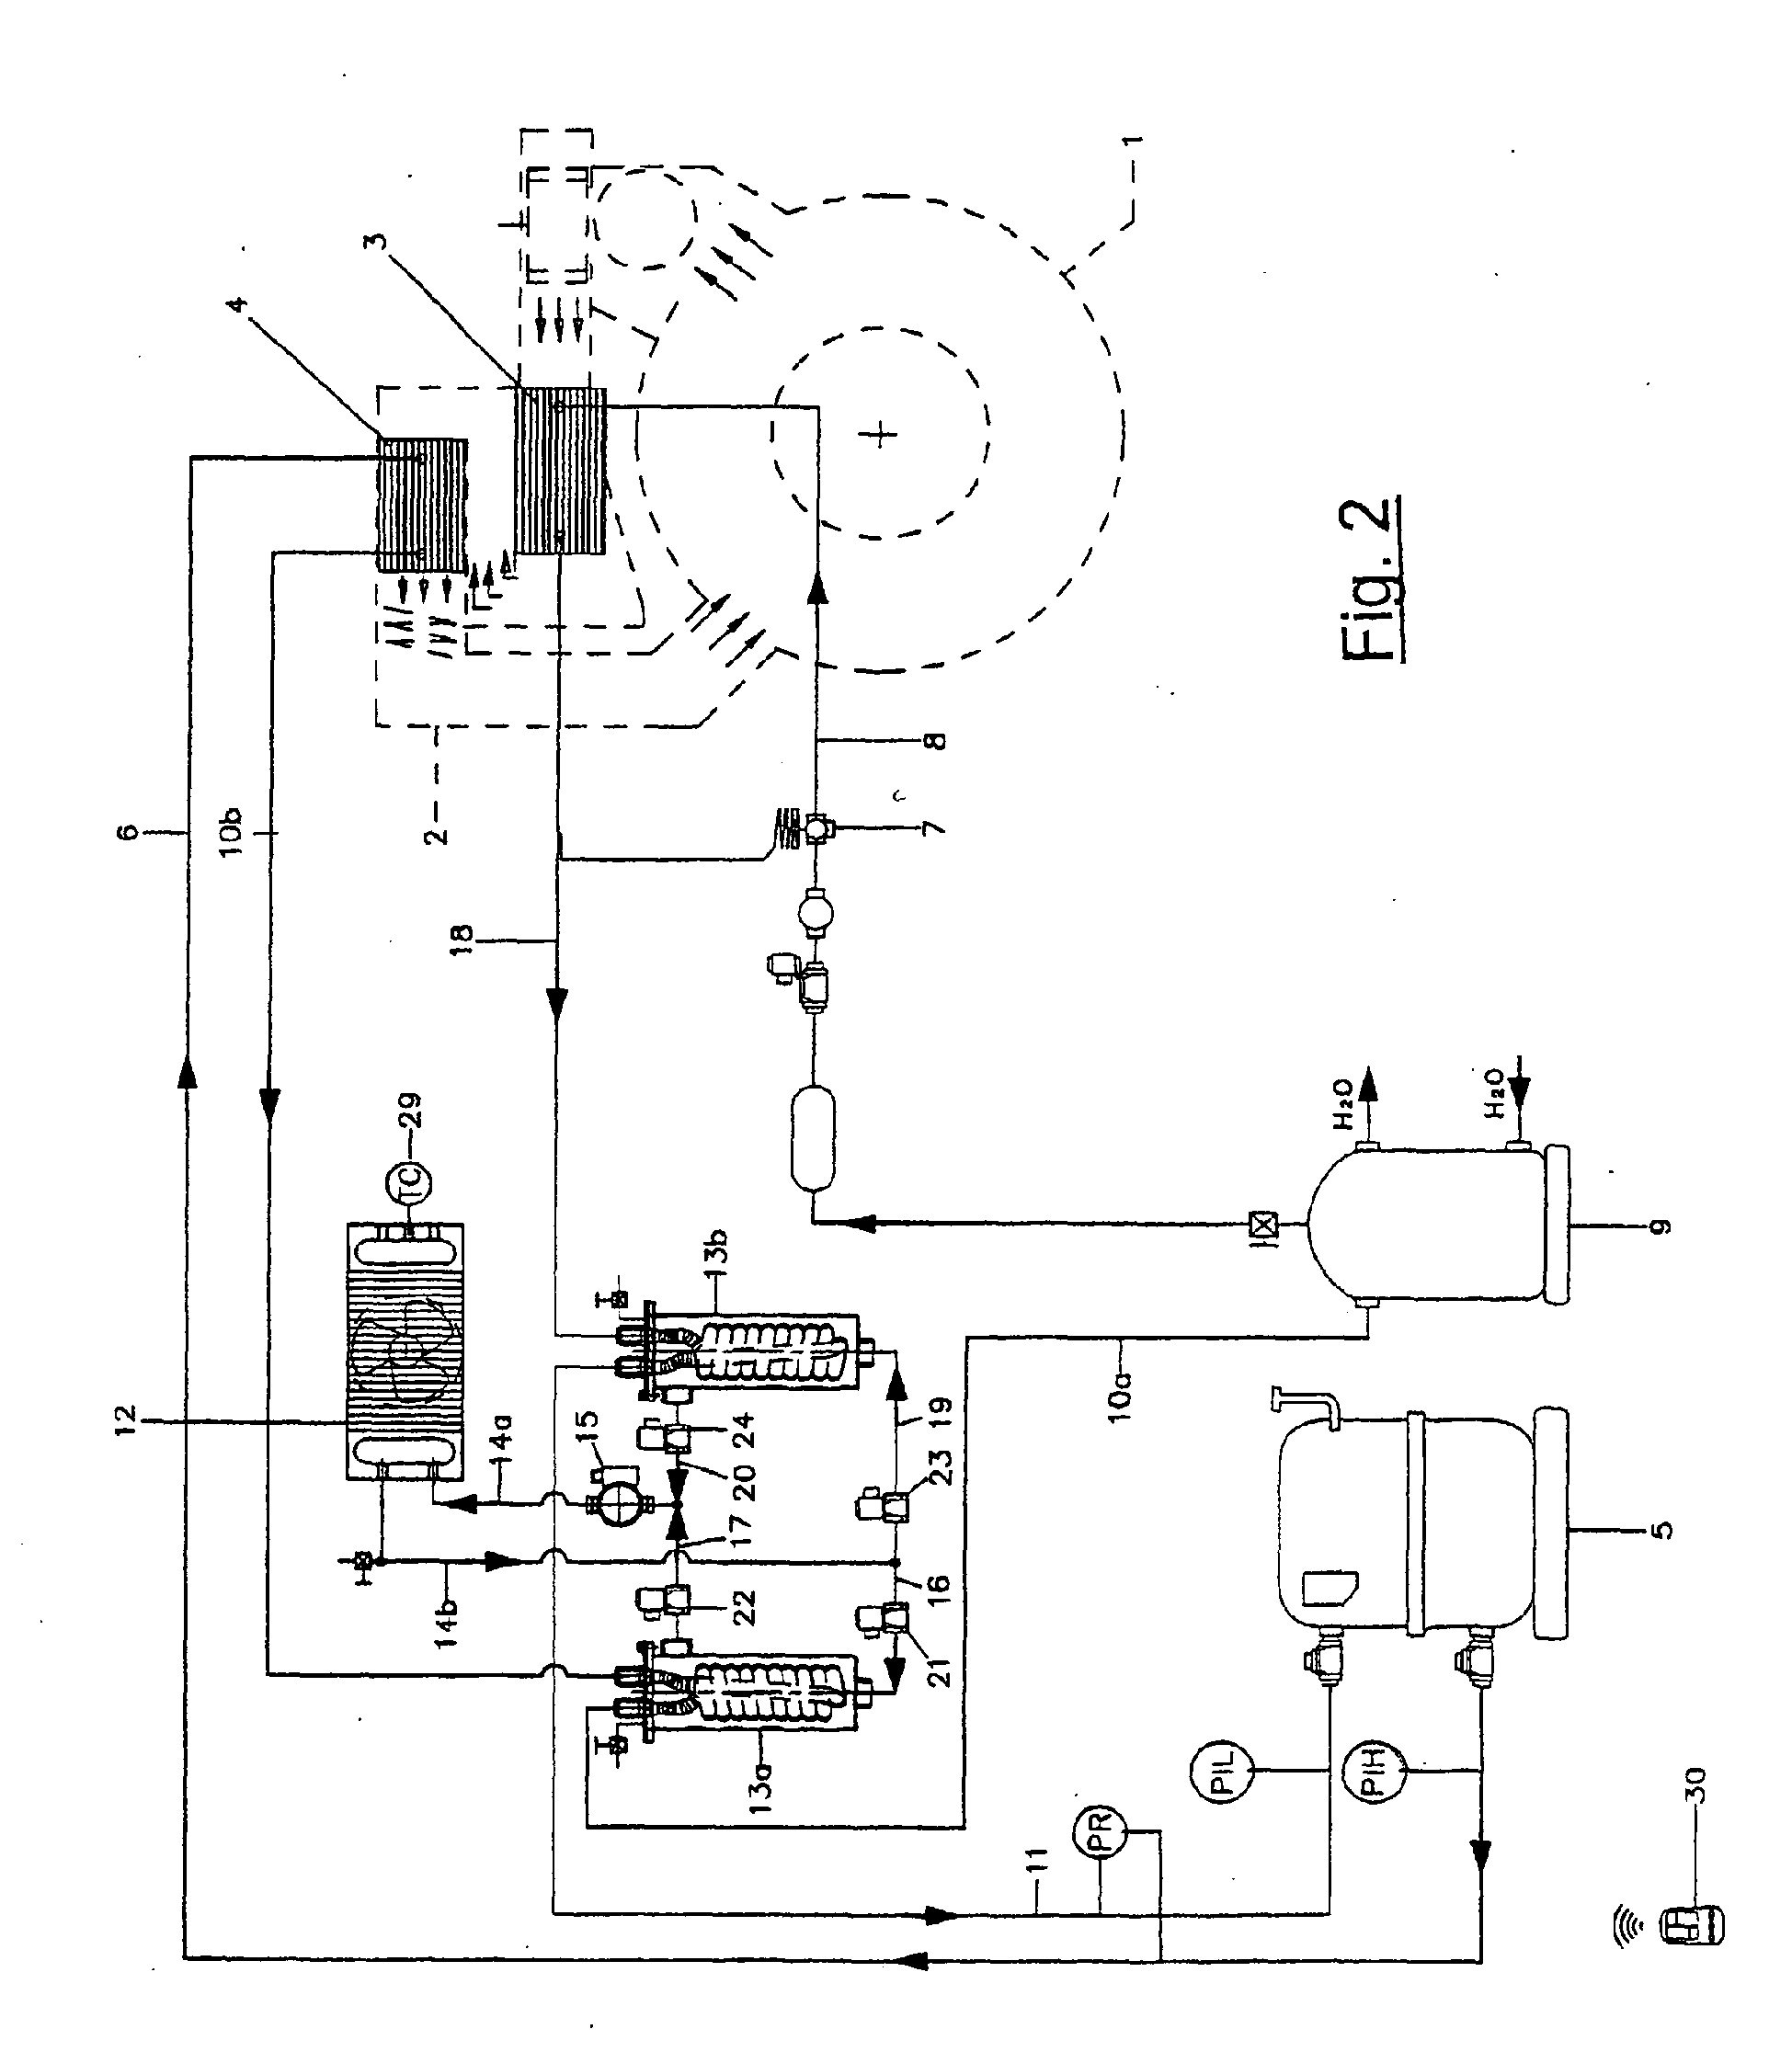 patent ep1607512b1